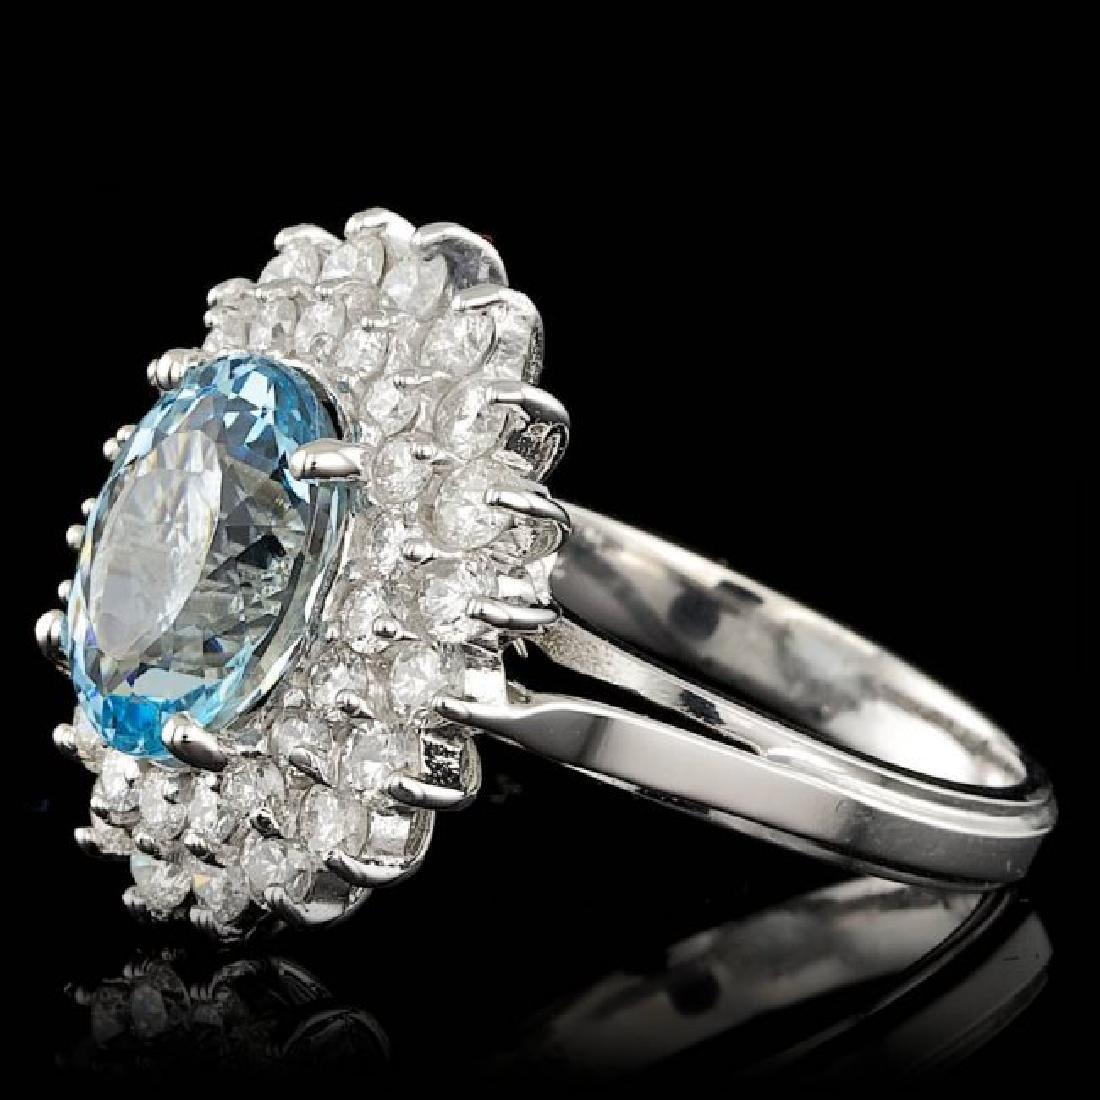 14k Gold 3.00ct Aquamarine 1.60ct Diamond Ring - 2